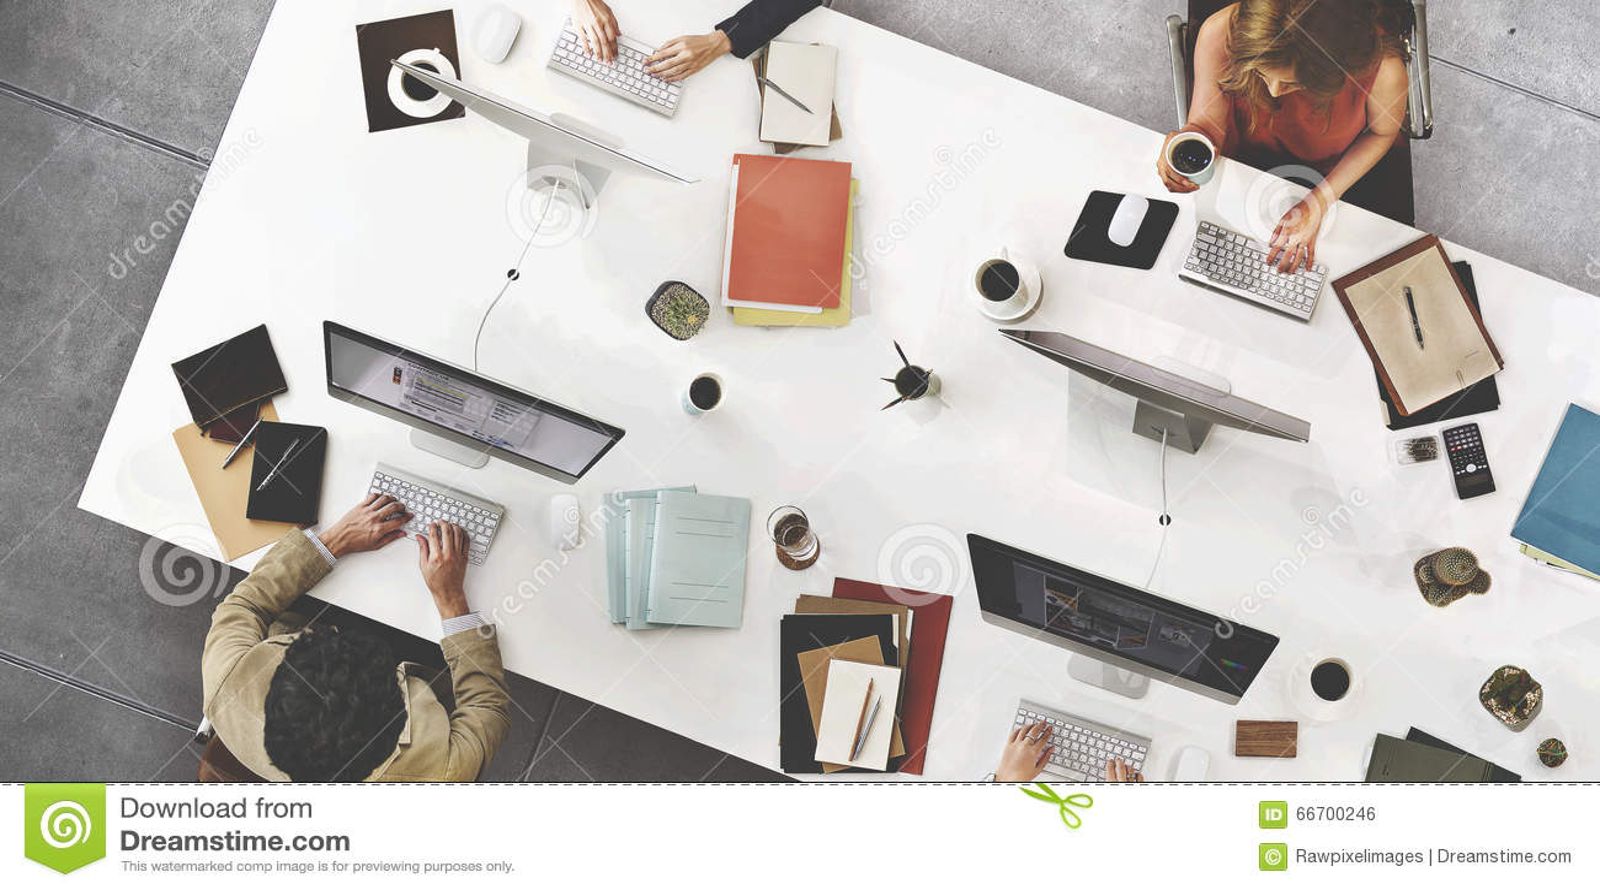 Concepto de Team Meeting Connection Digital Technology del negocio